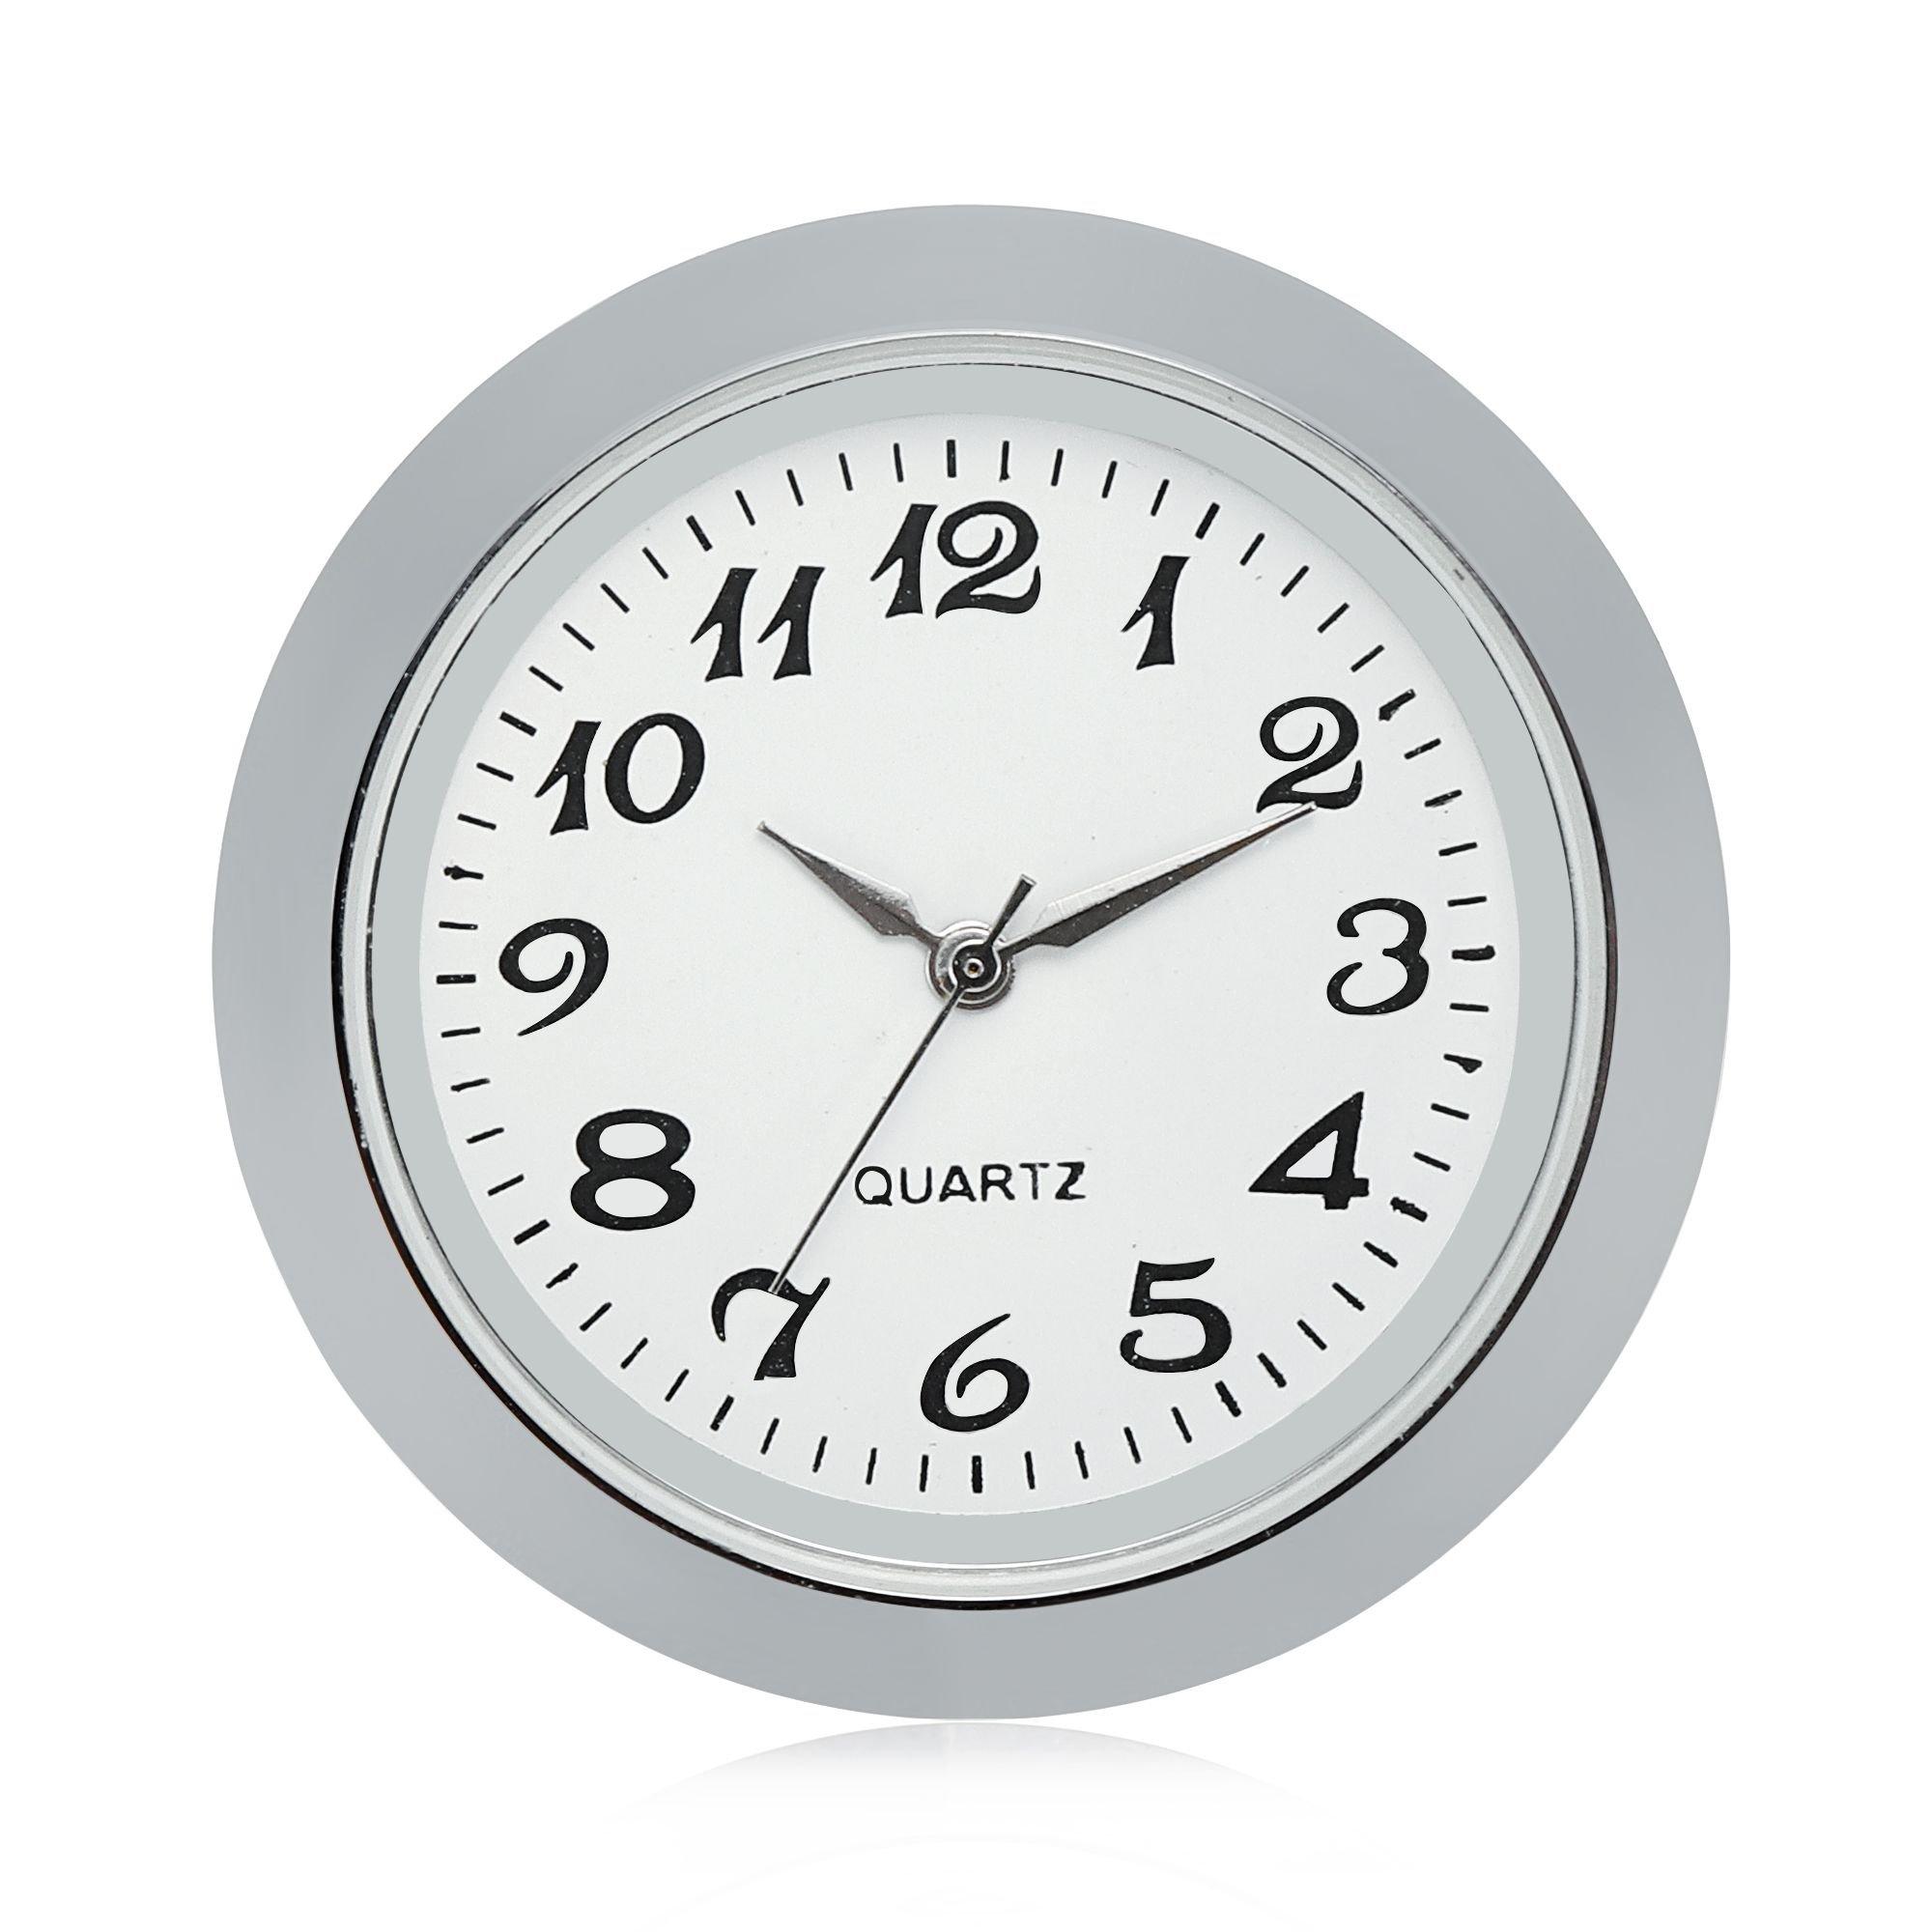 "ShoppeWatch Mini Clock Insert Quartz Movement Round 1 7/16"" (35mm) Miniature Clock Fit Up White Face Silver Tone Bezel Arabic Numerals CK095SL"